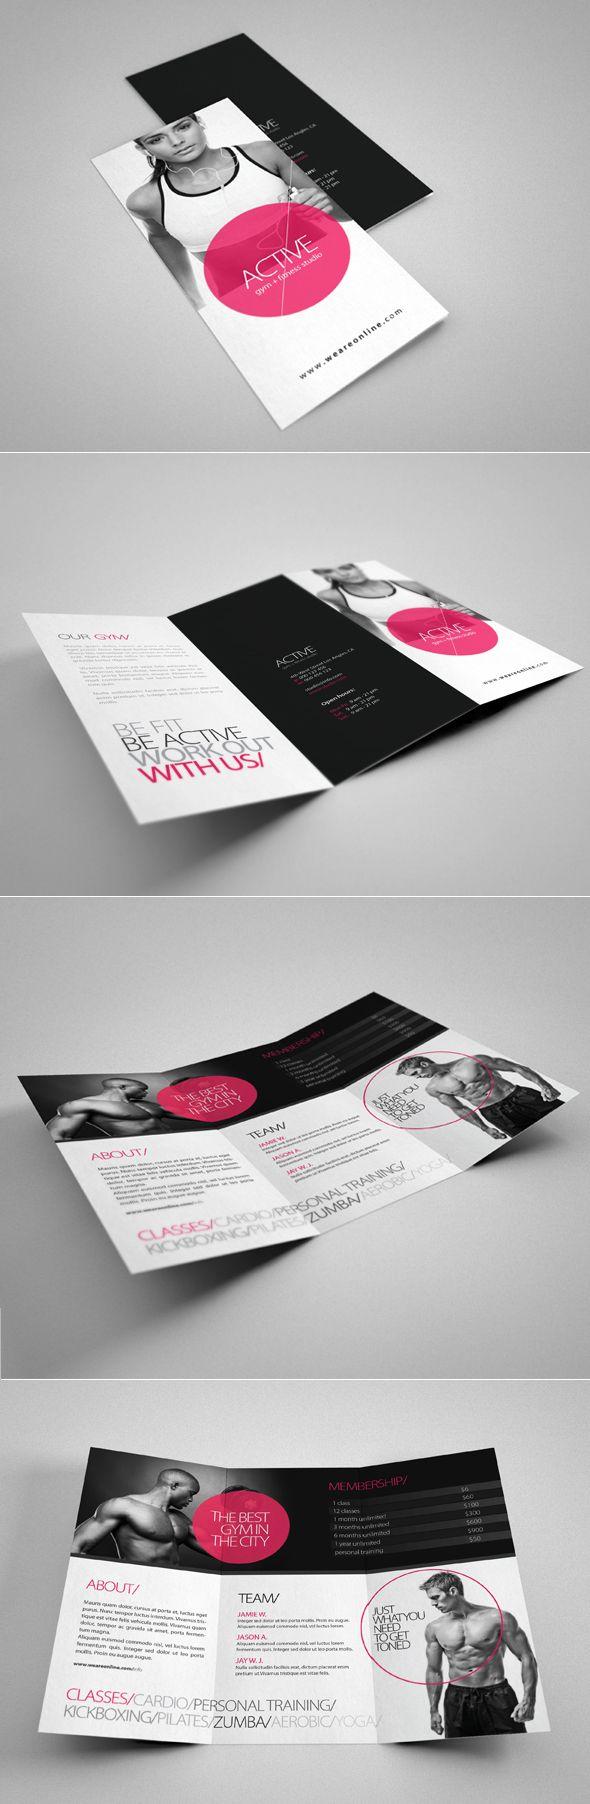 Fitness Tri Fold Brochure by 24beyond.deviantart.com on @deviantART